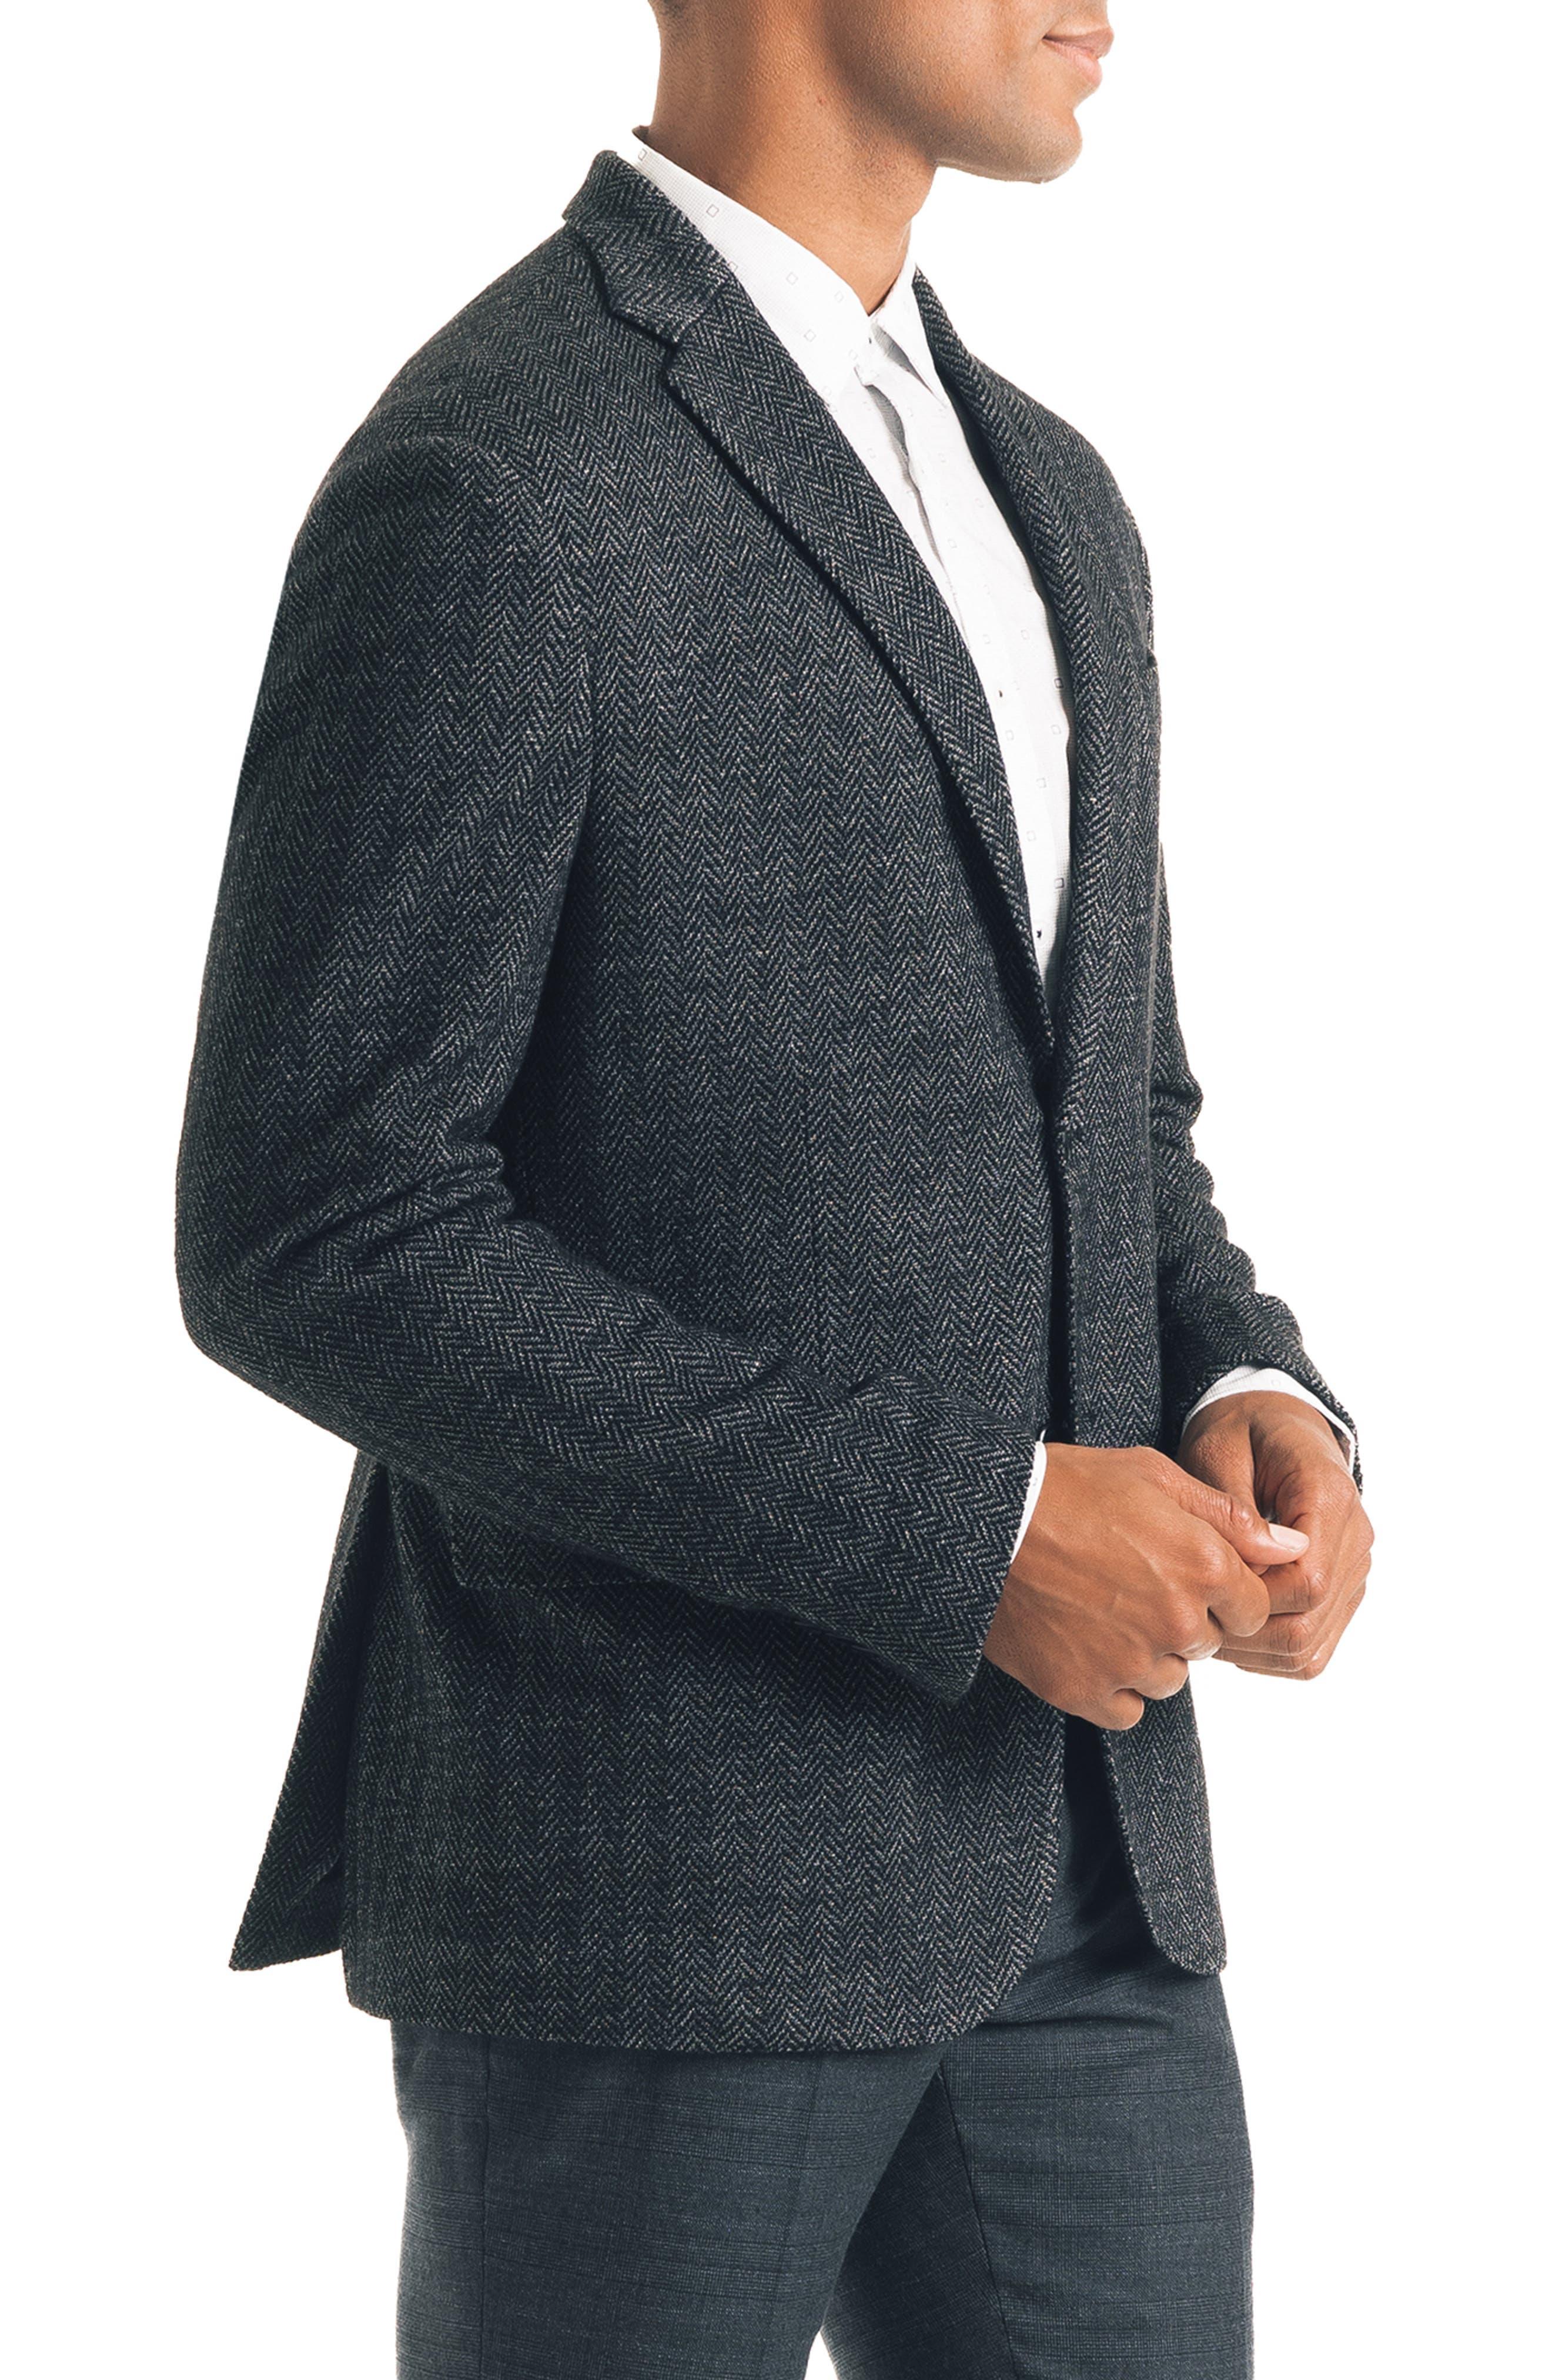 Uptown Trim Fit Herringbone Cotton Blend Sport Coat,                             Alternate thumbnail 3, color,                             BLACK